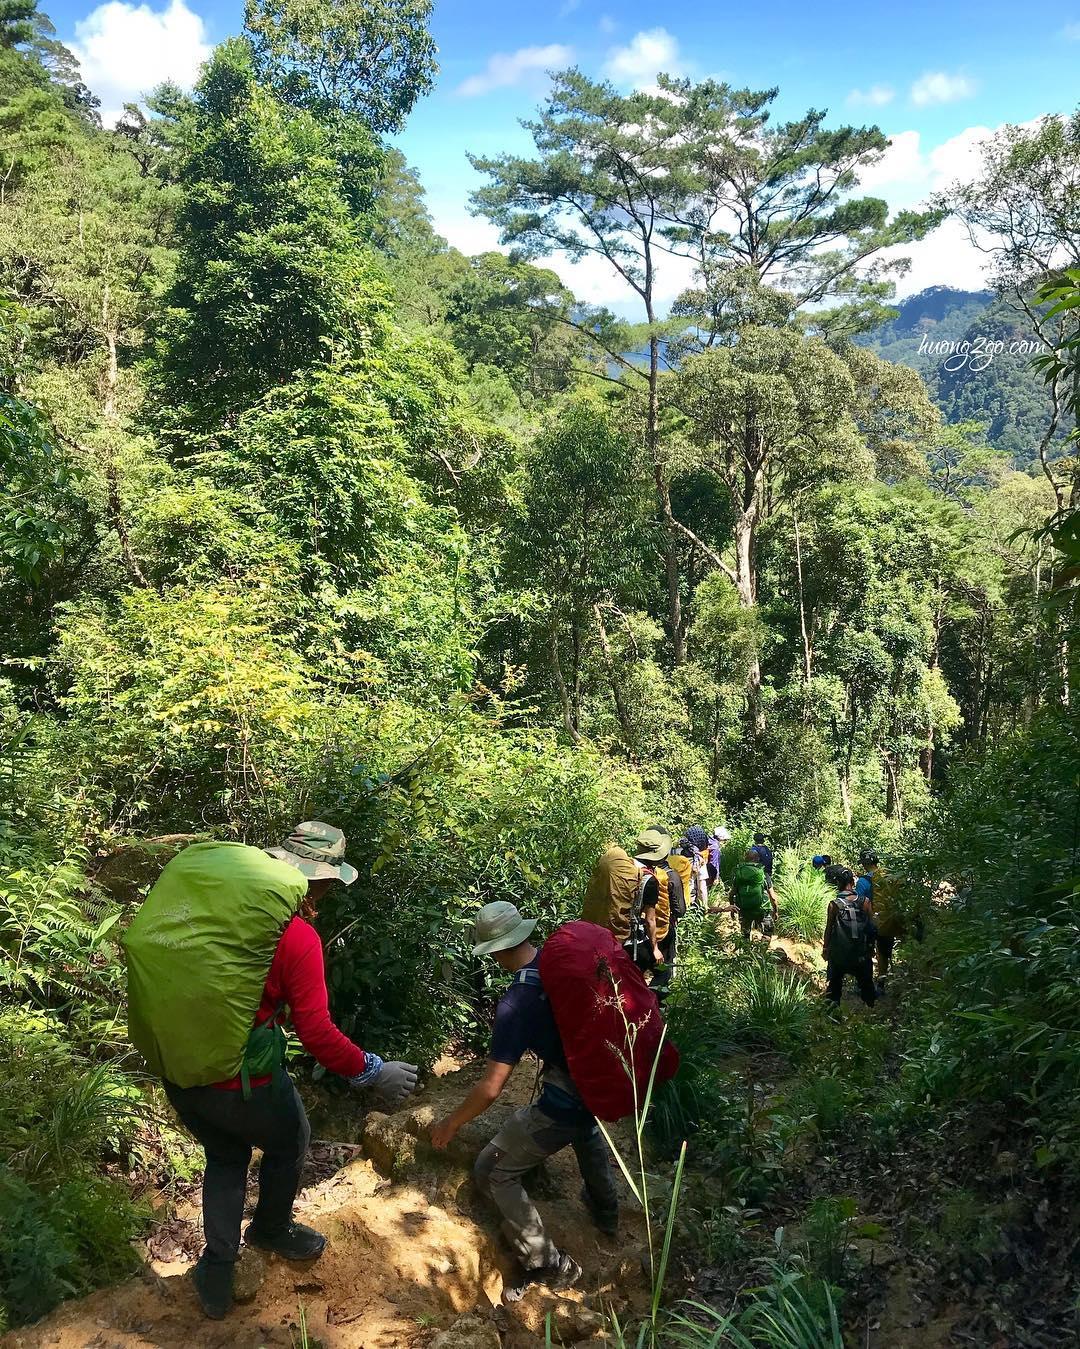 dak lak- an attractive destination for backpackers